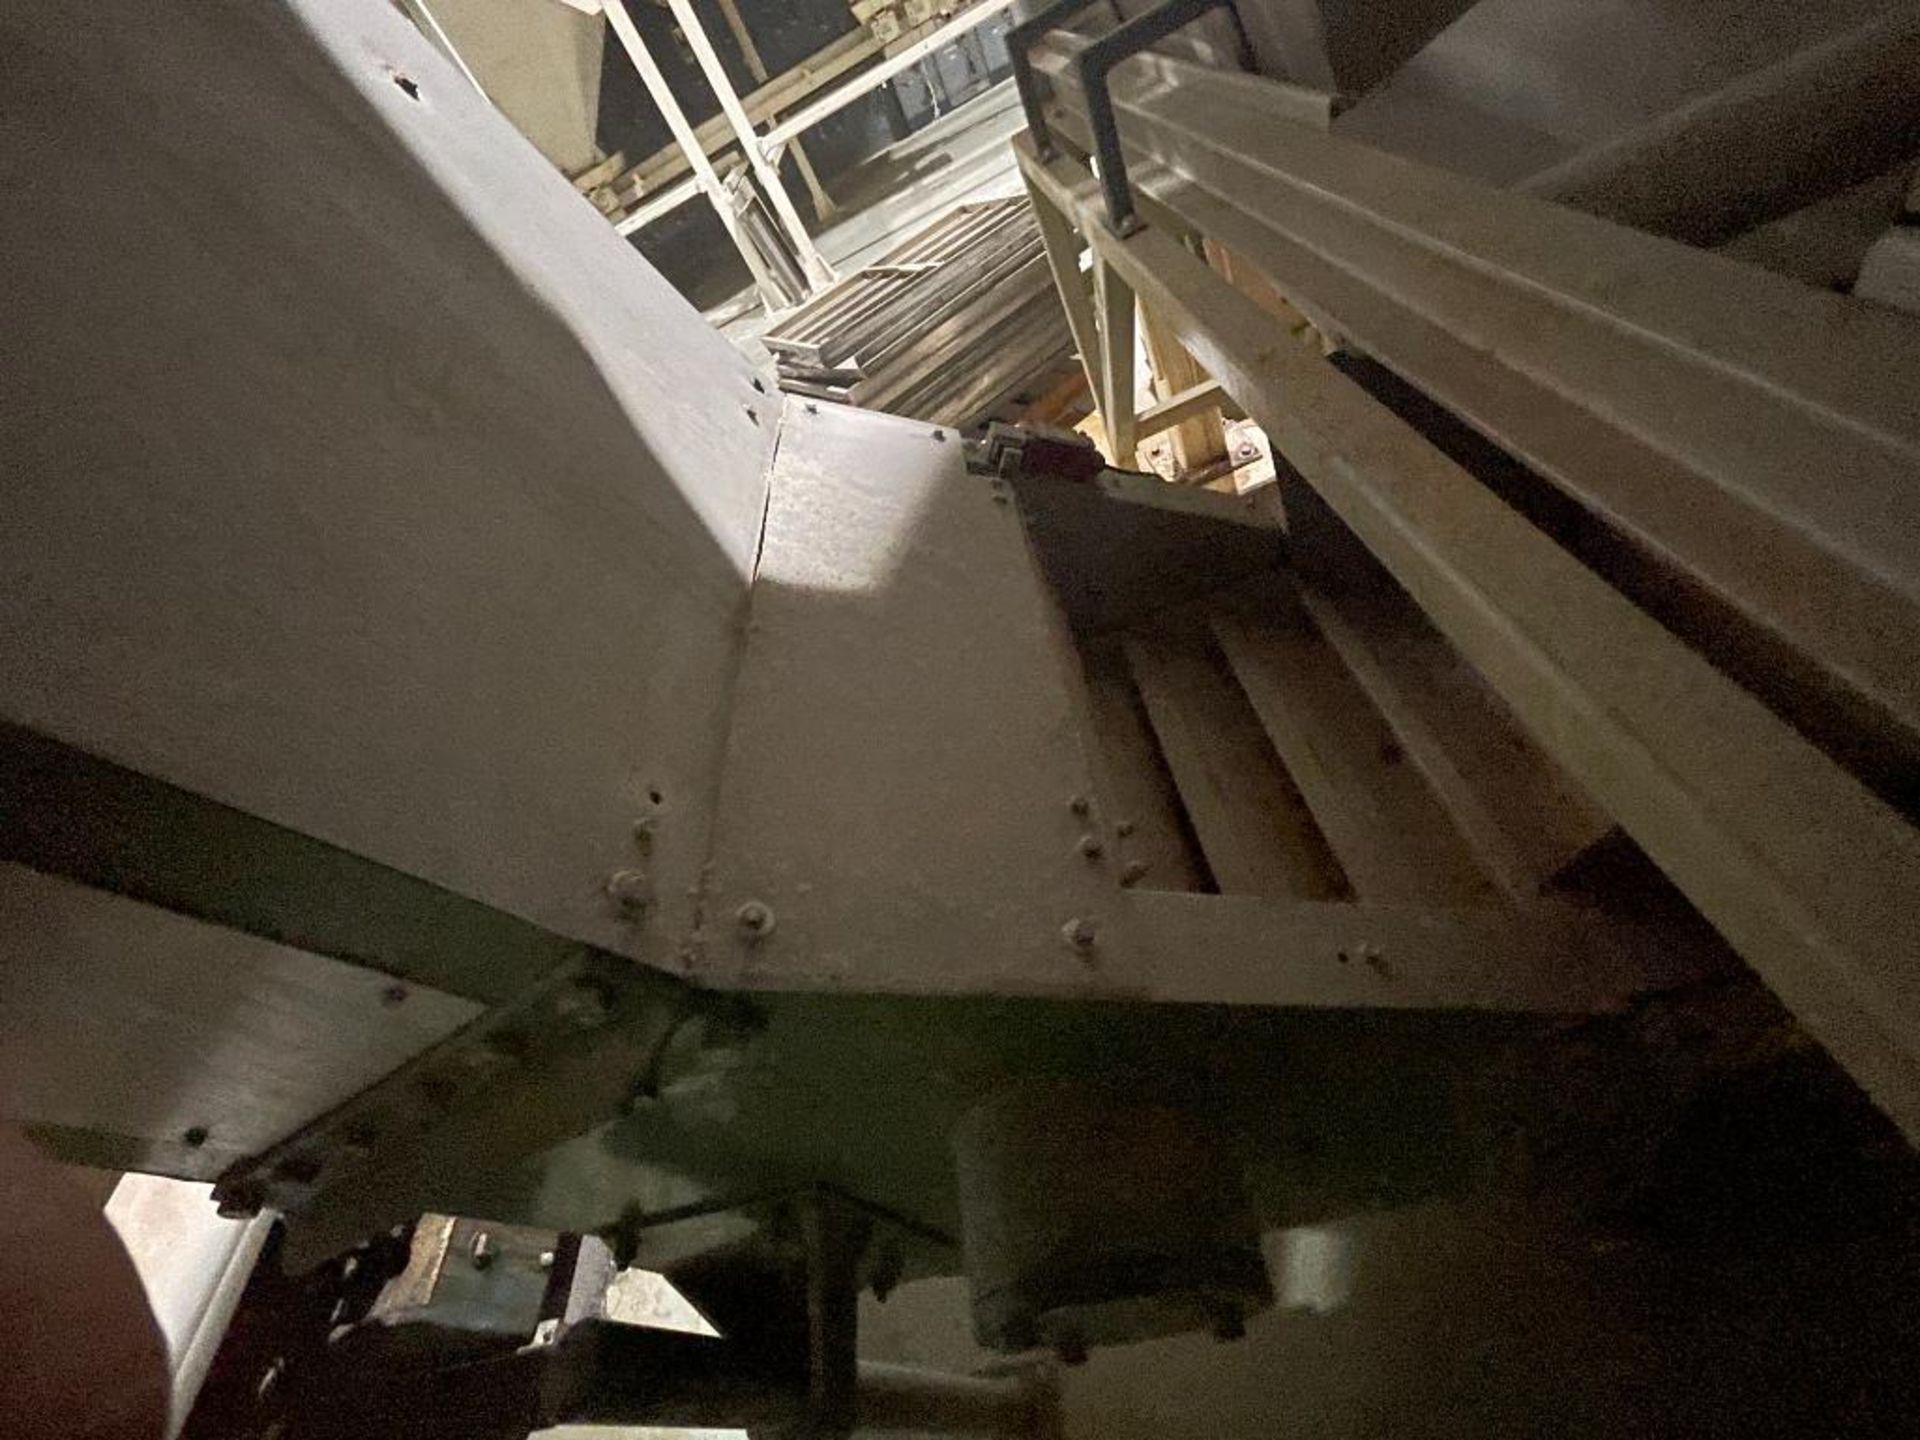 mild steel incline overlapping bucket conveyor - Image 5 of 7